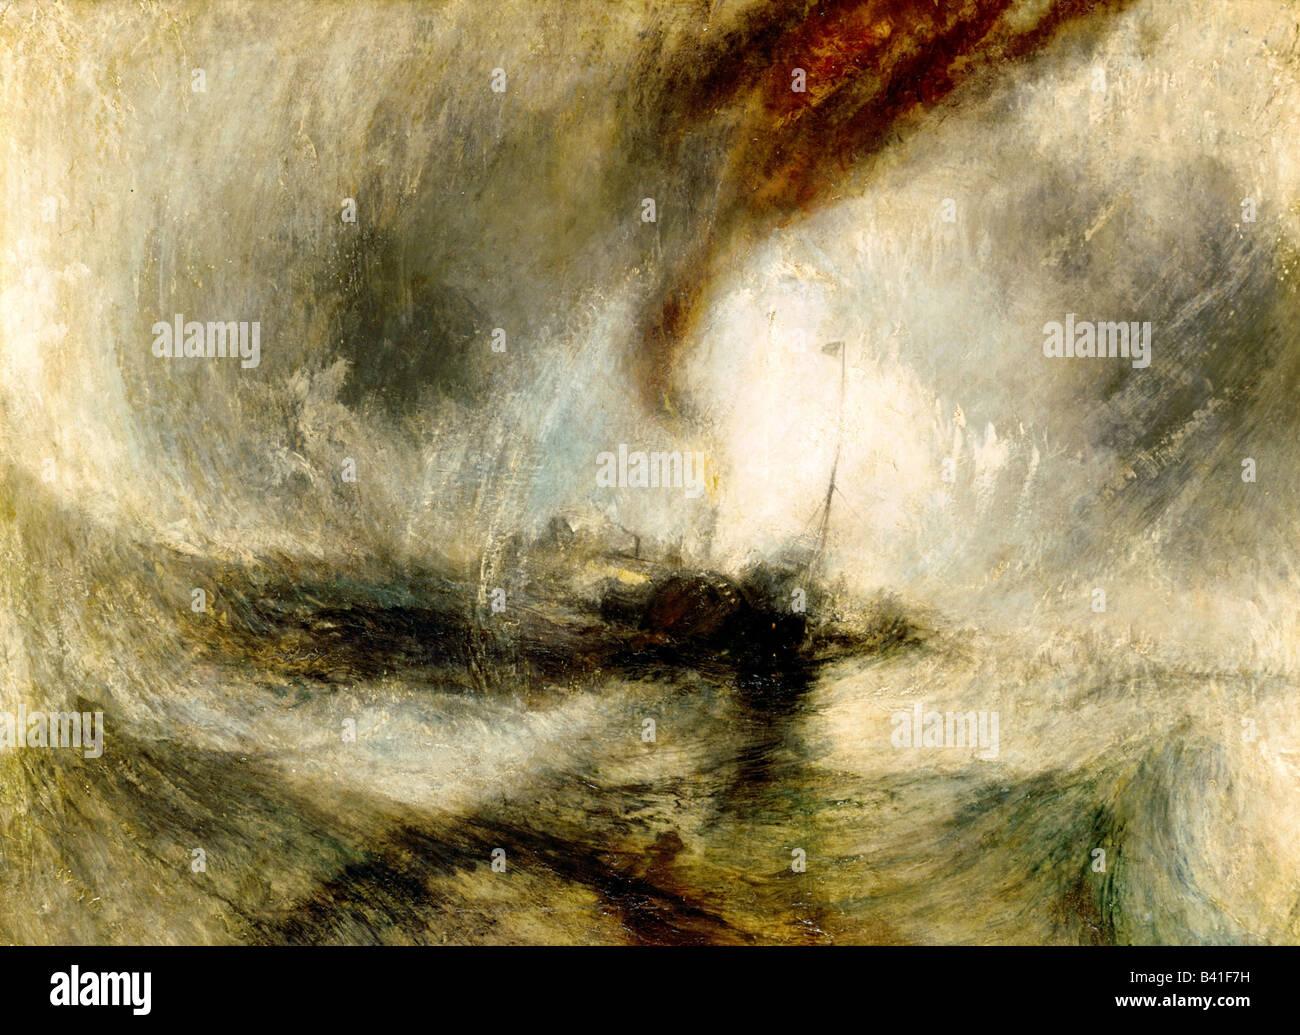 Beaux-arts, Turner, Joseph Mallord William (1775 - 1851), la peinture 'Snow Storm', 1842, huile sur toile, Photo Stock